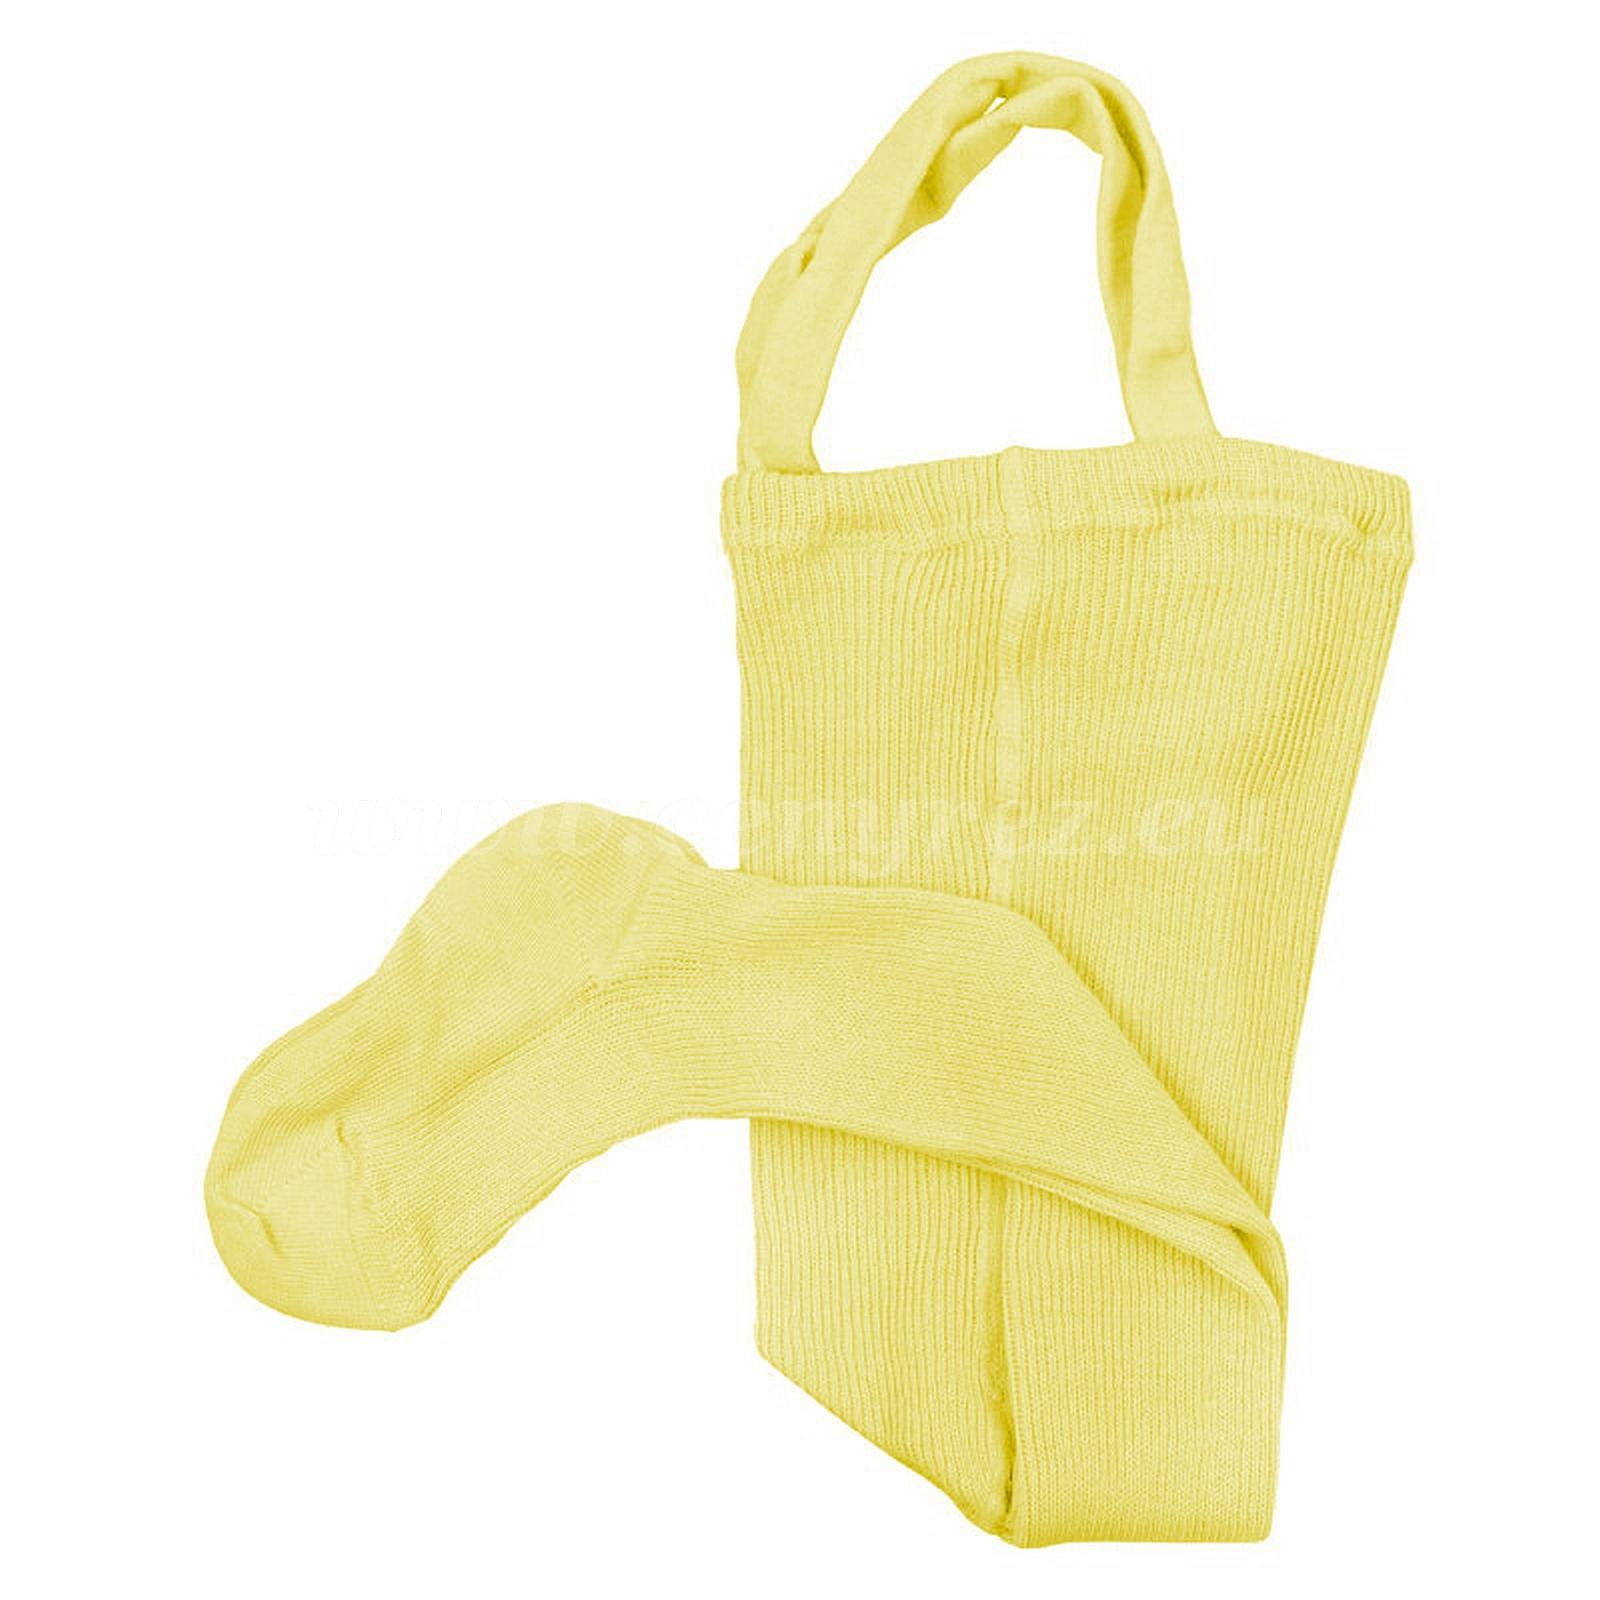 DUCIKA Babystrumpfhosen mit Trägern - gelb